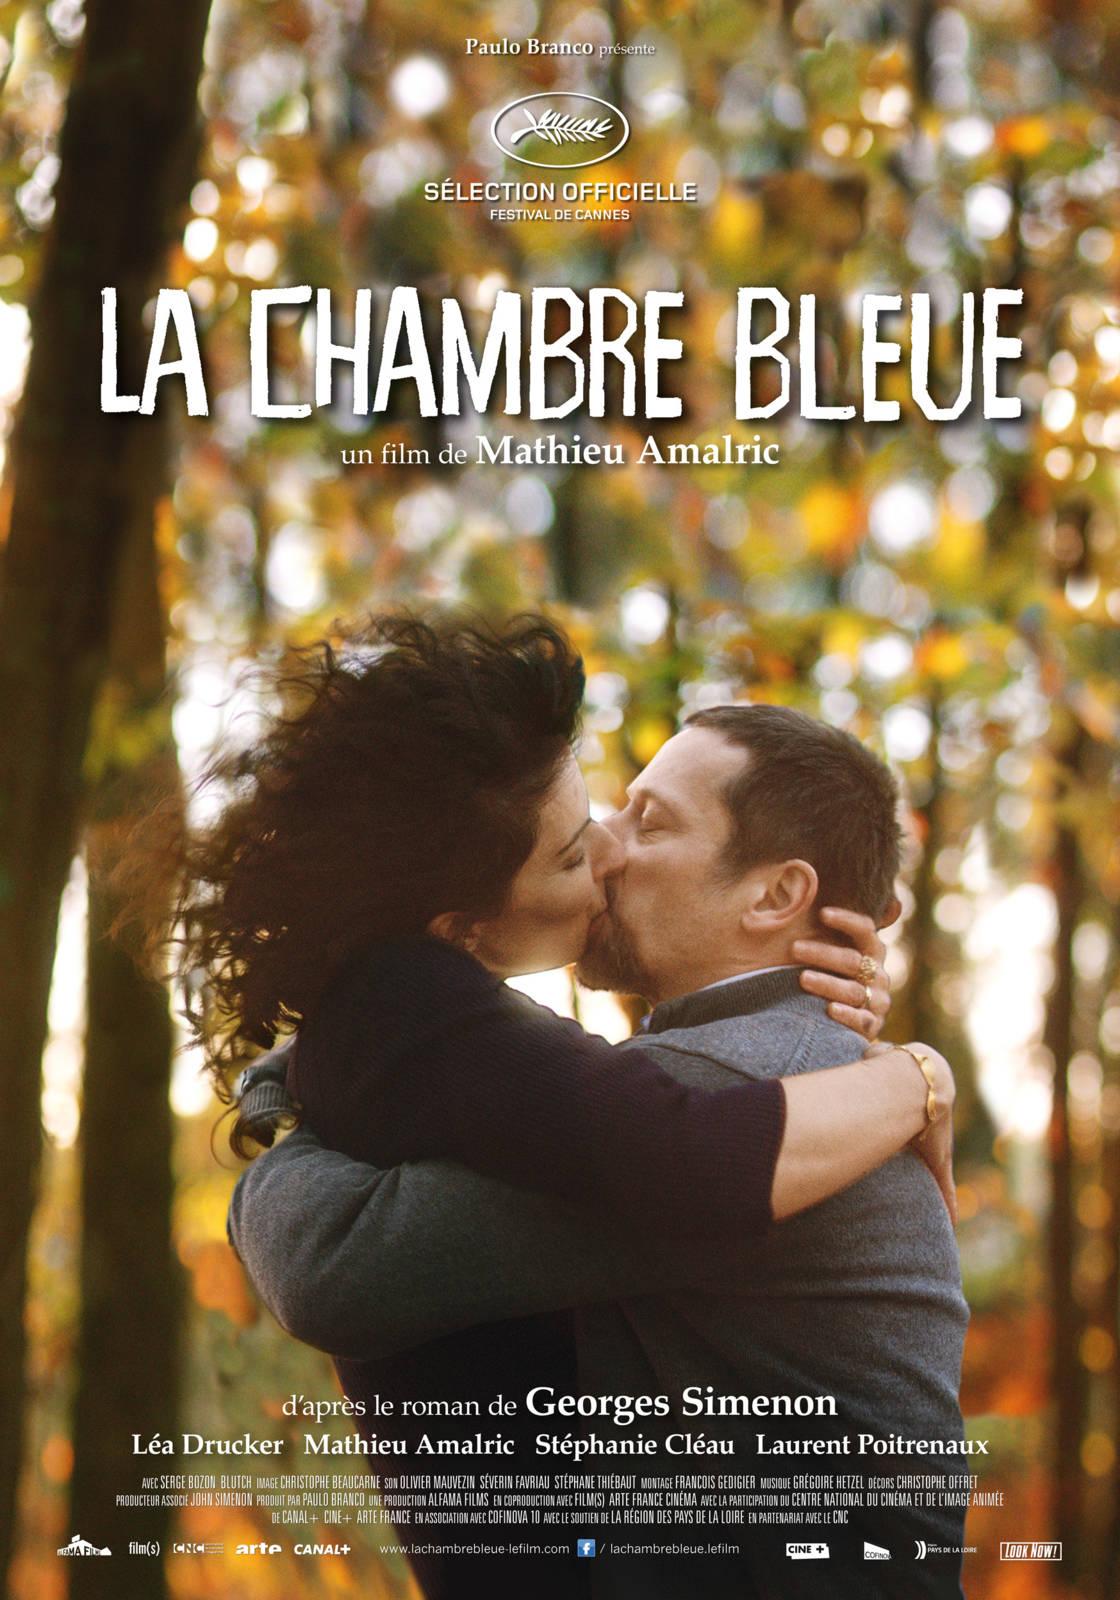 Film la chambre bleue cineman for Chambre bleue film